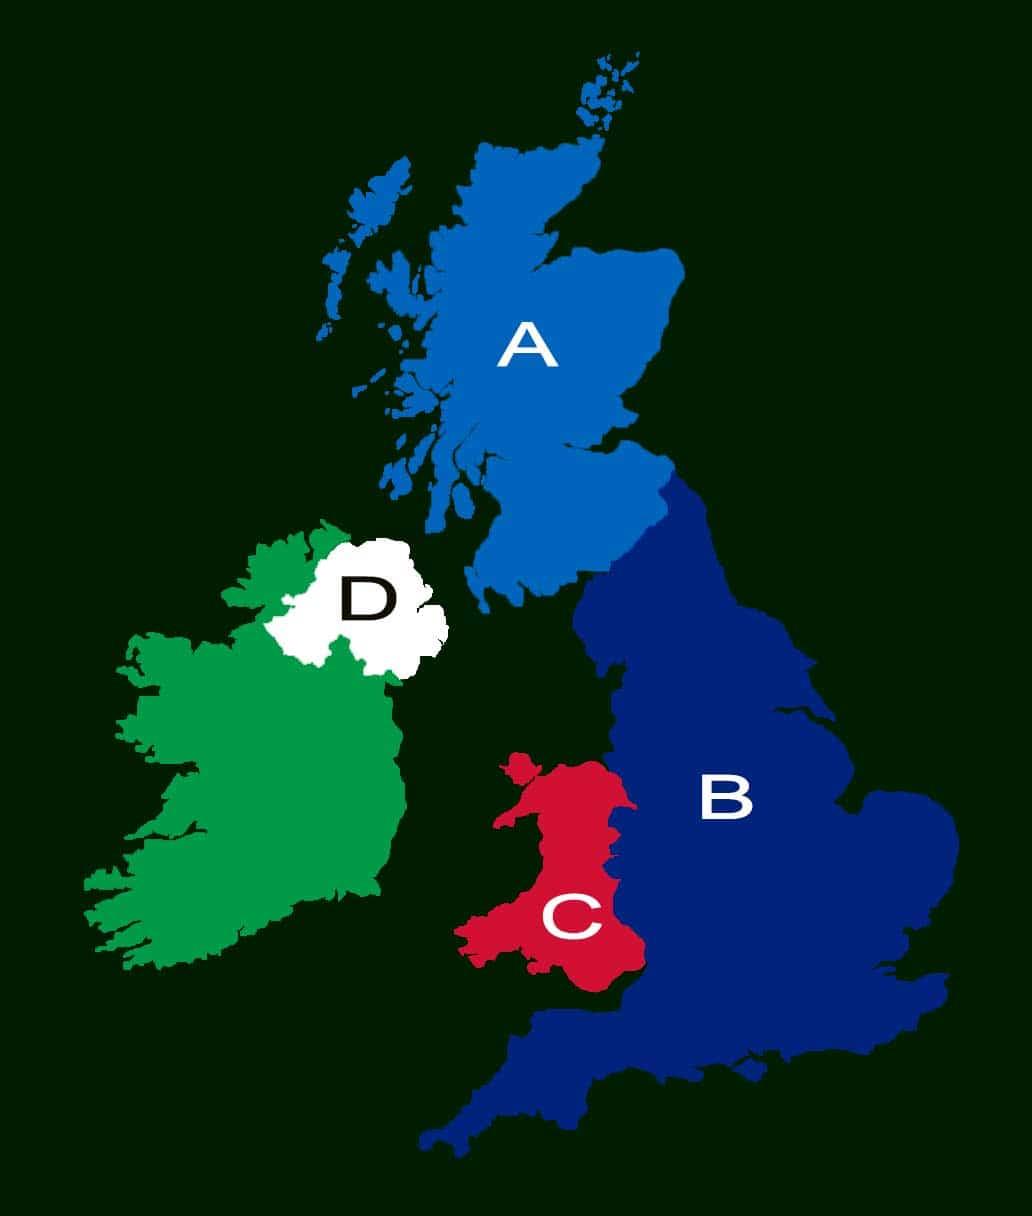 united_kingdom_kleuren-c-zonder-aanduiding-ierland